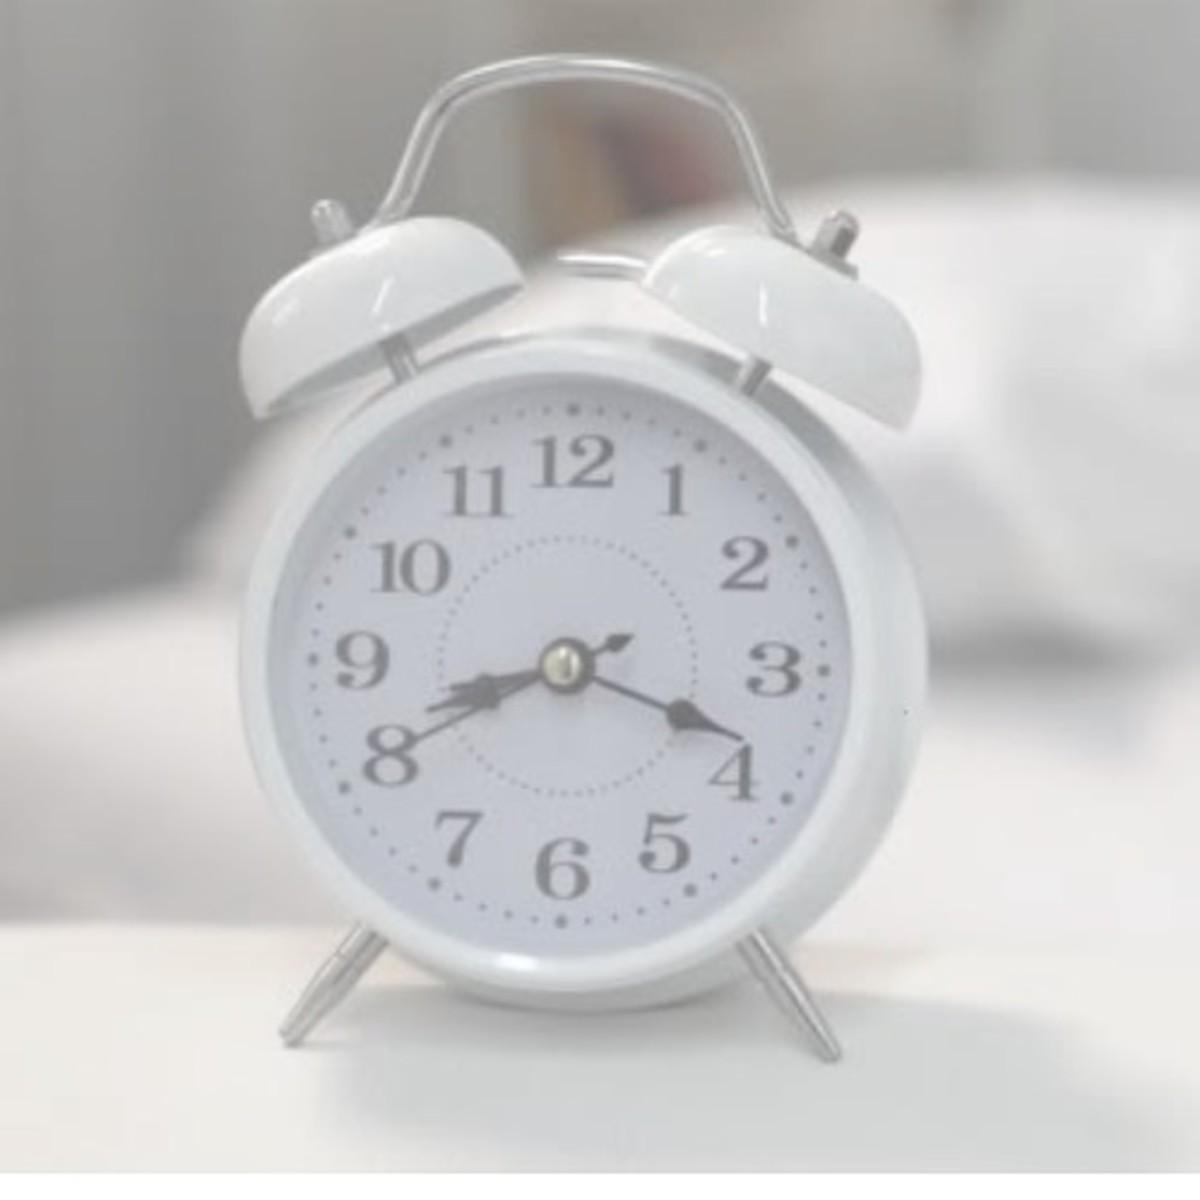 Expert Sleep Tips for Babies